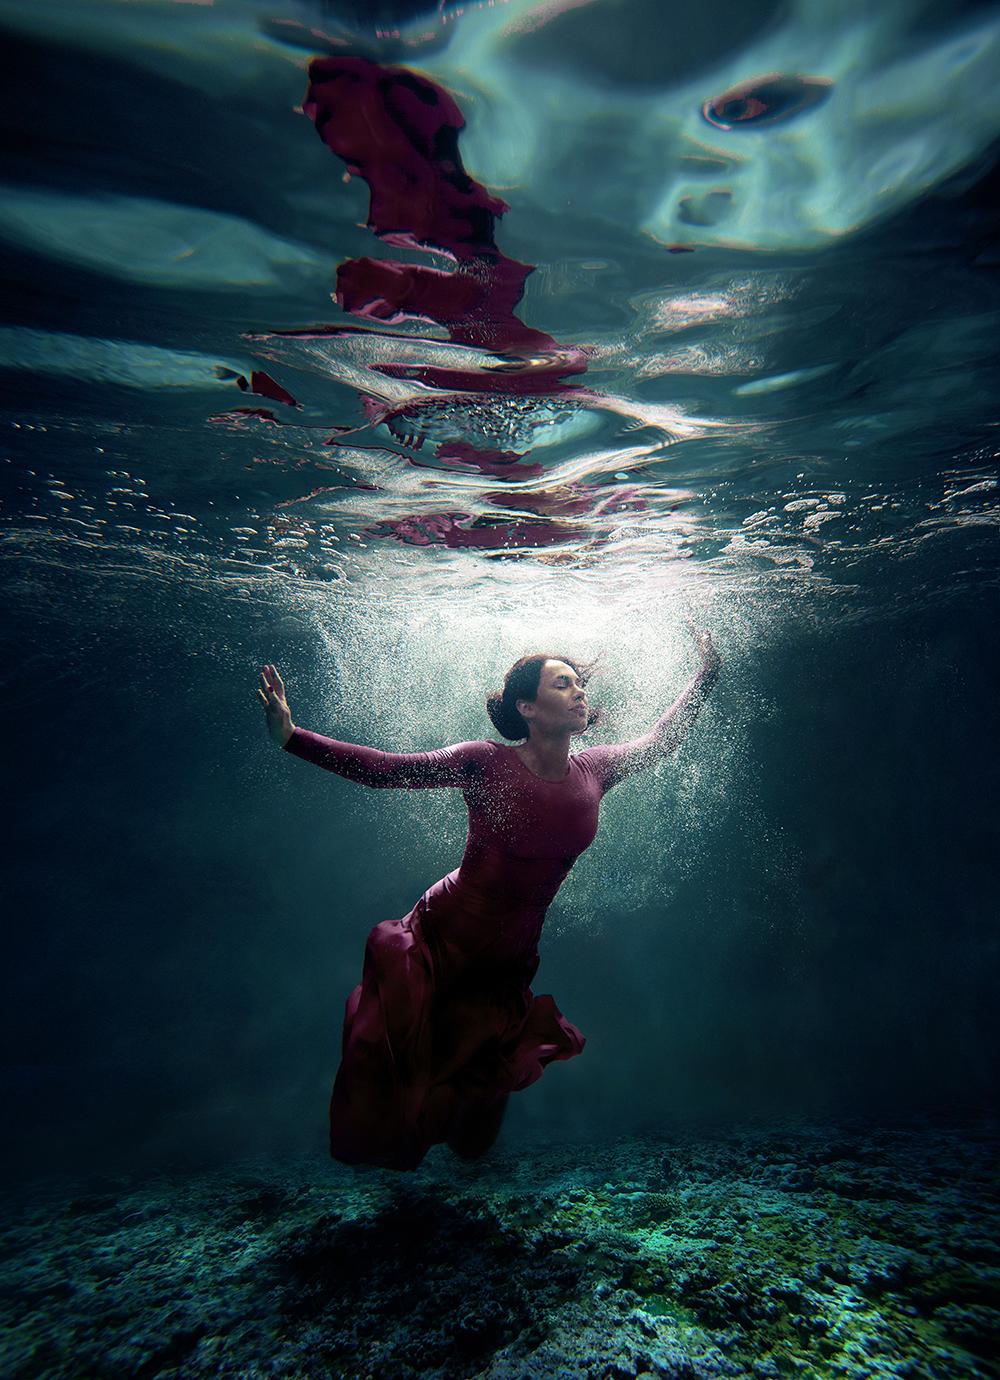 stylish-and-romantic-underwater-photography-by-glory-grebenkin-5